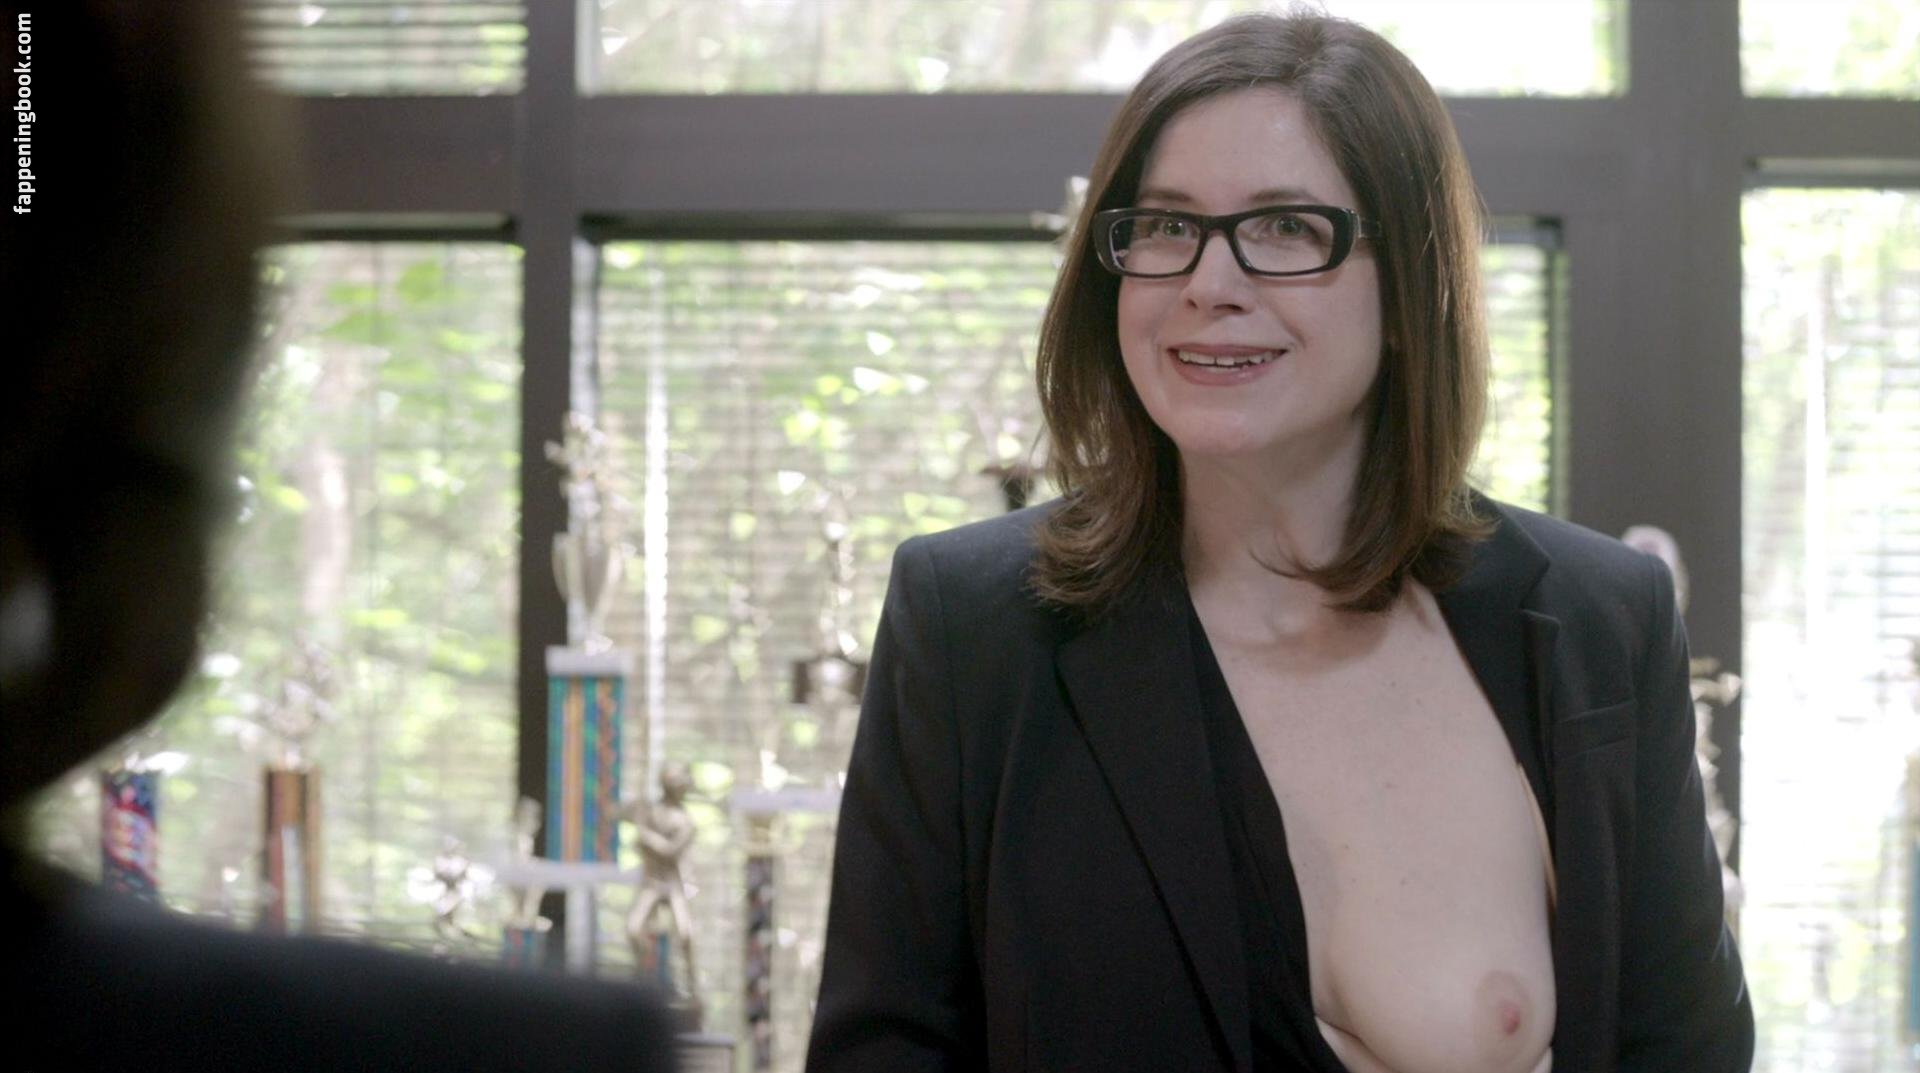 Sonia nackt Suhl Sonia Suhl